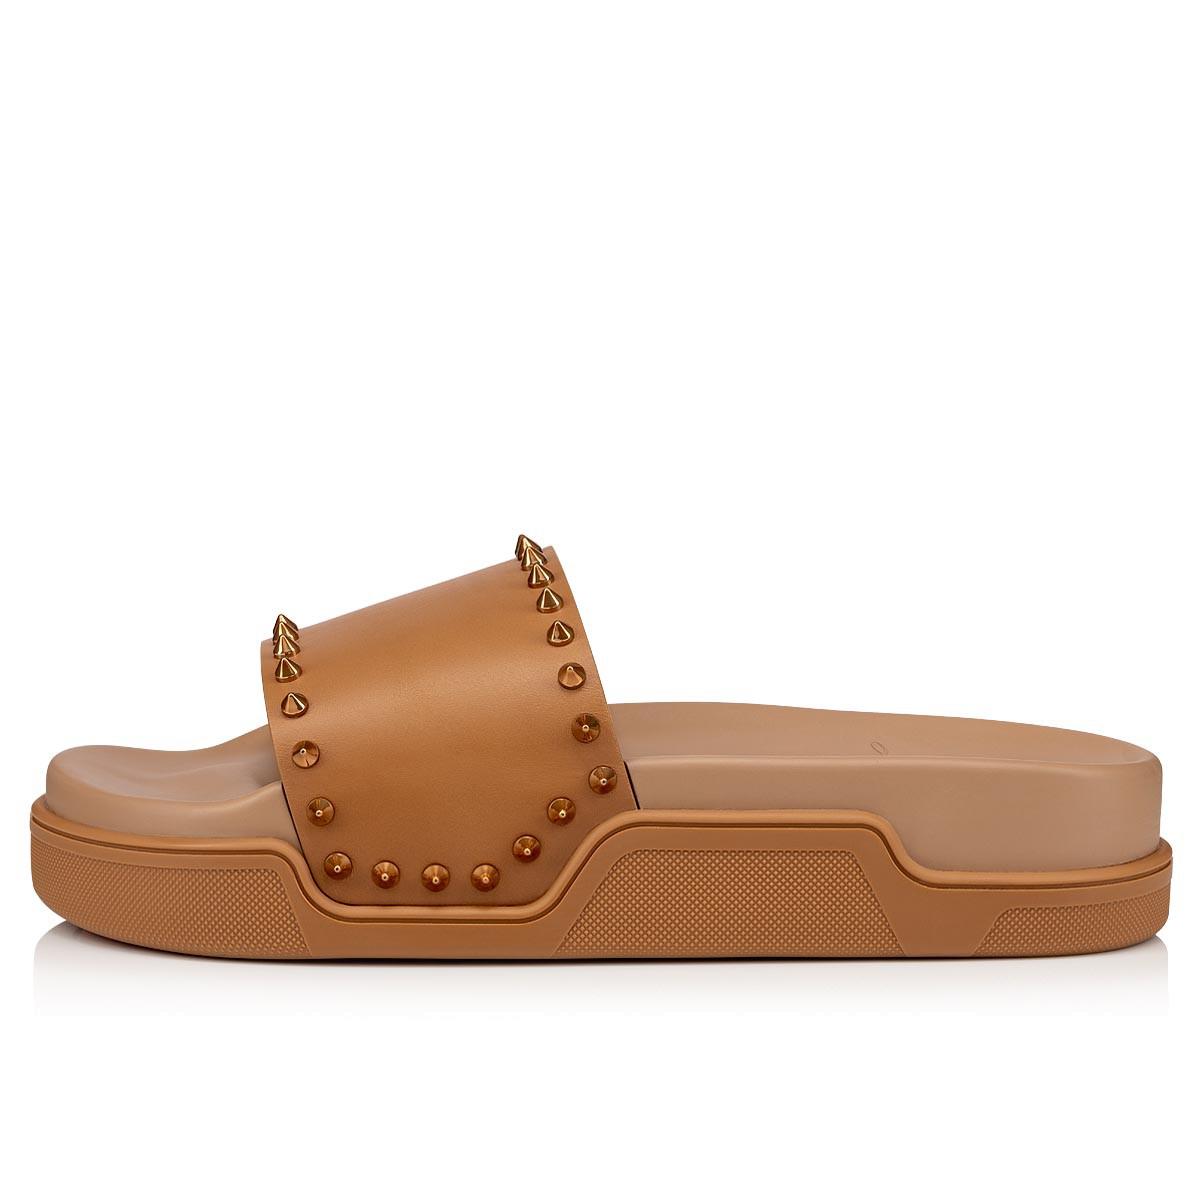 Shoes - Pool Stud - Christian Louboutin